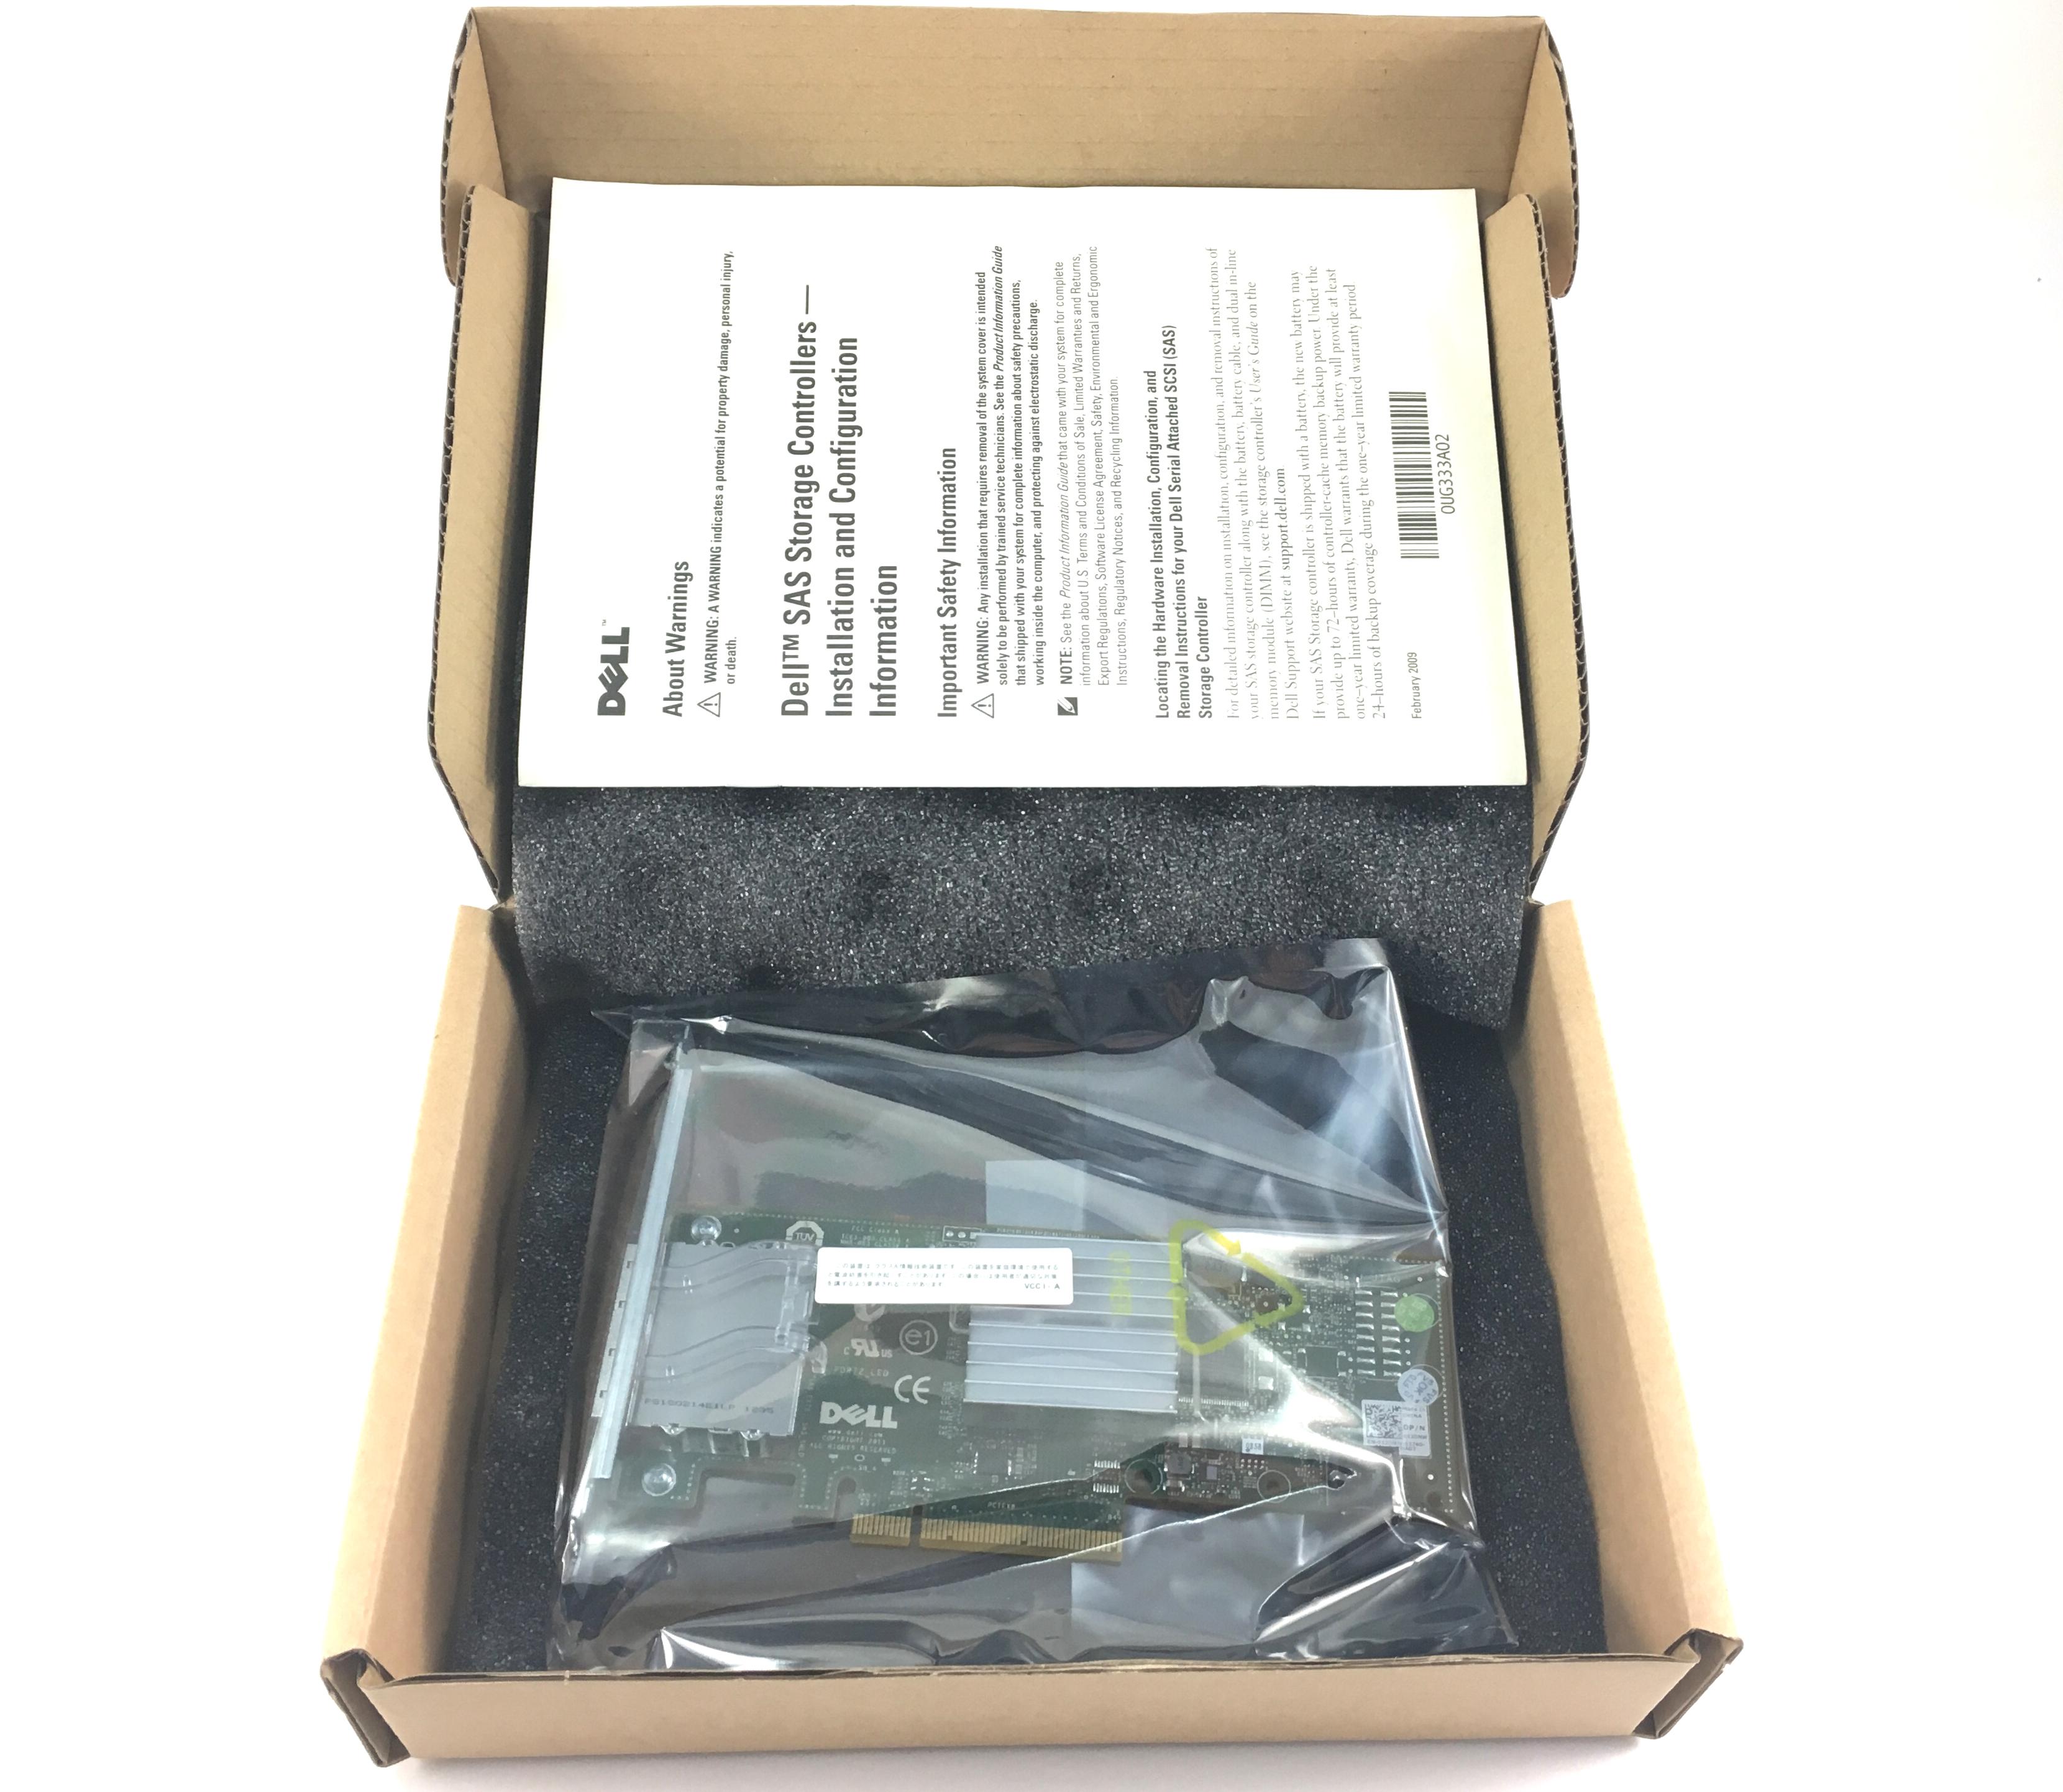 DELL PERC H200E 6GBPS DUAL PORT PCI-E RAID CONTROLLER (12DNW)